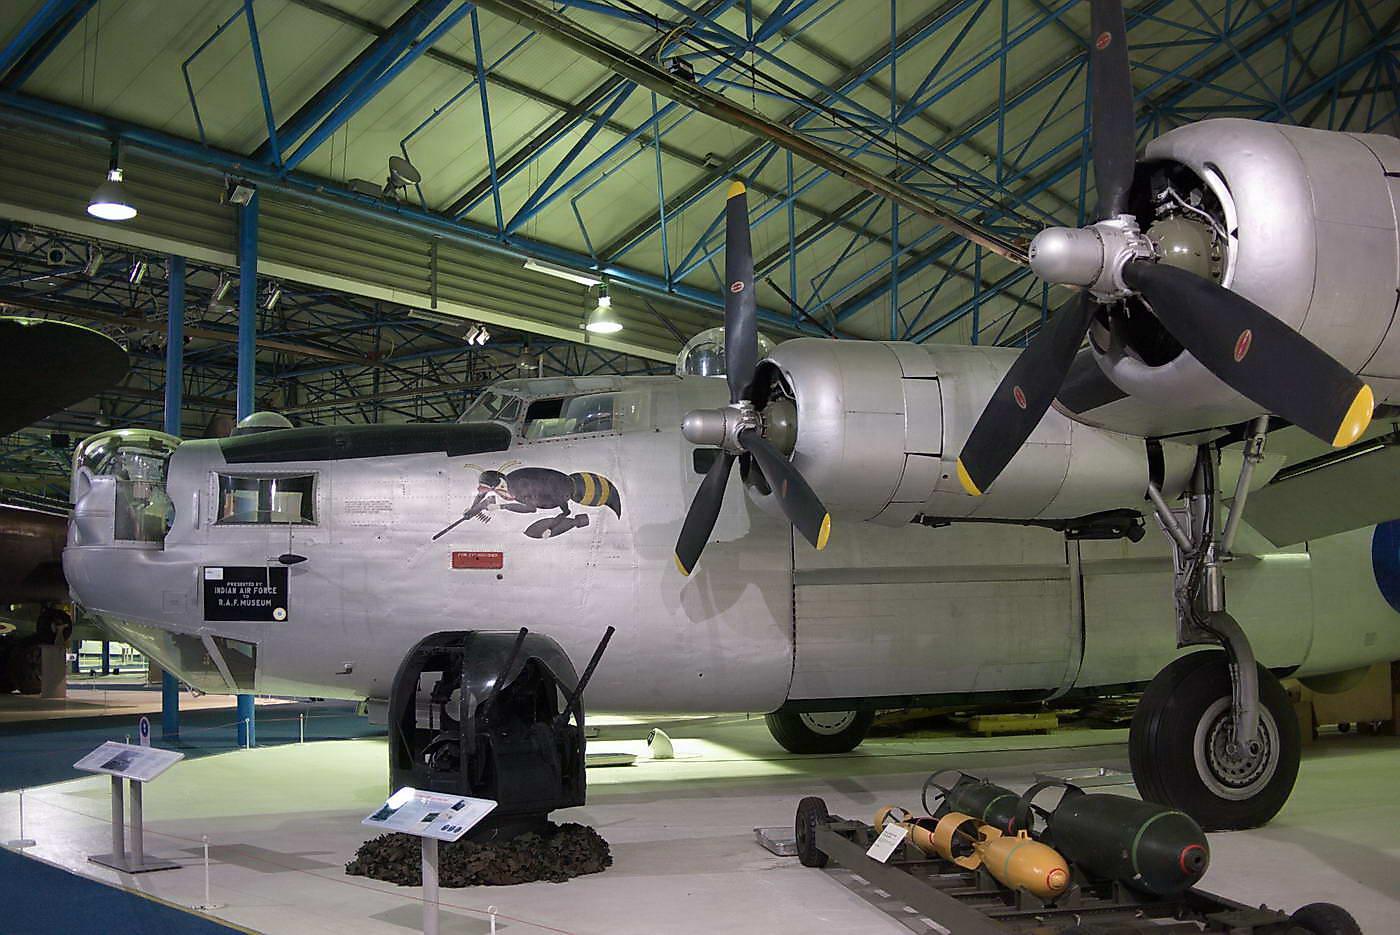 Consolidated B24L-20-FO Liberator